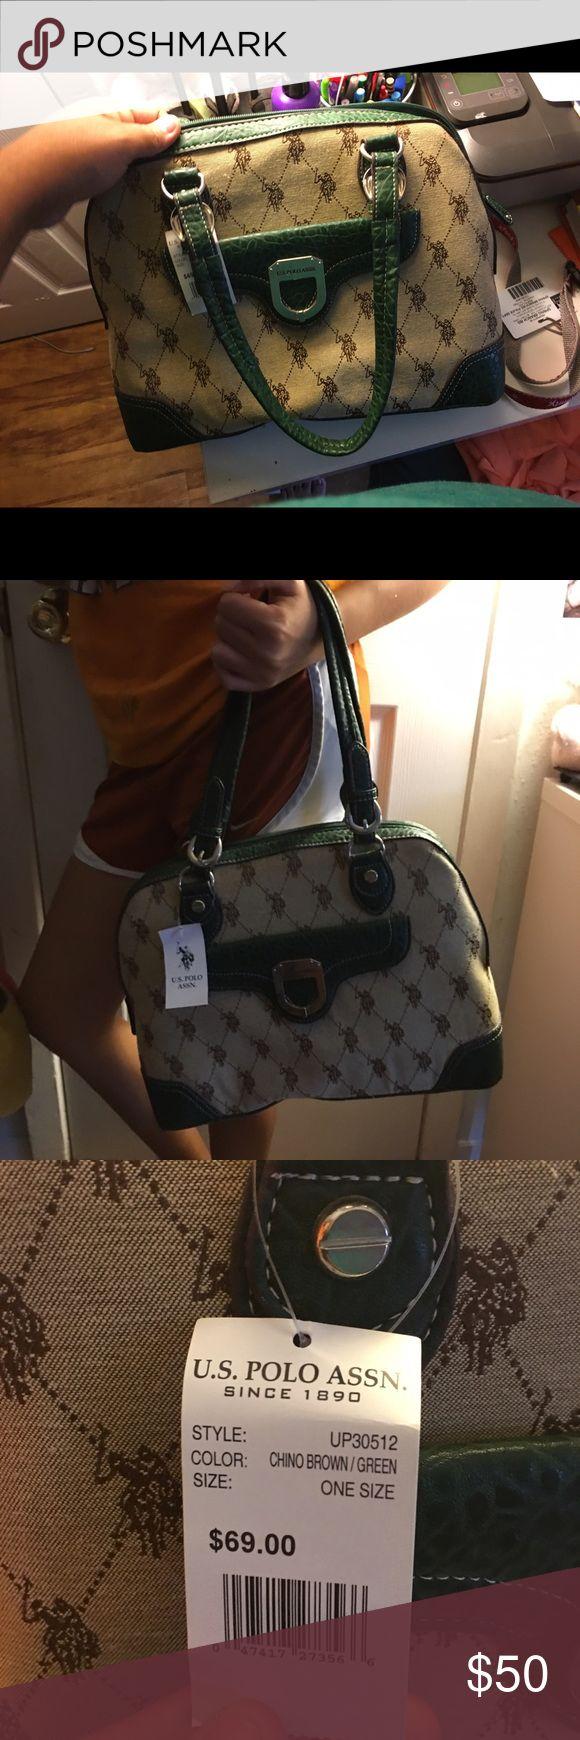 U.S polo handbag green u.s polo handbag new 🎉🎉🎉 U.S. Polo Assn. Bags Shoulder Bags